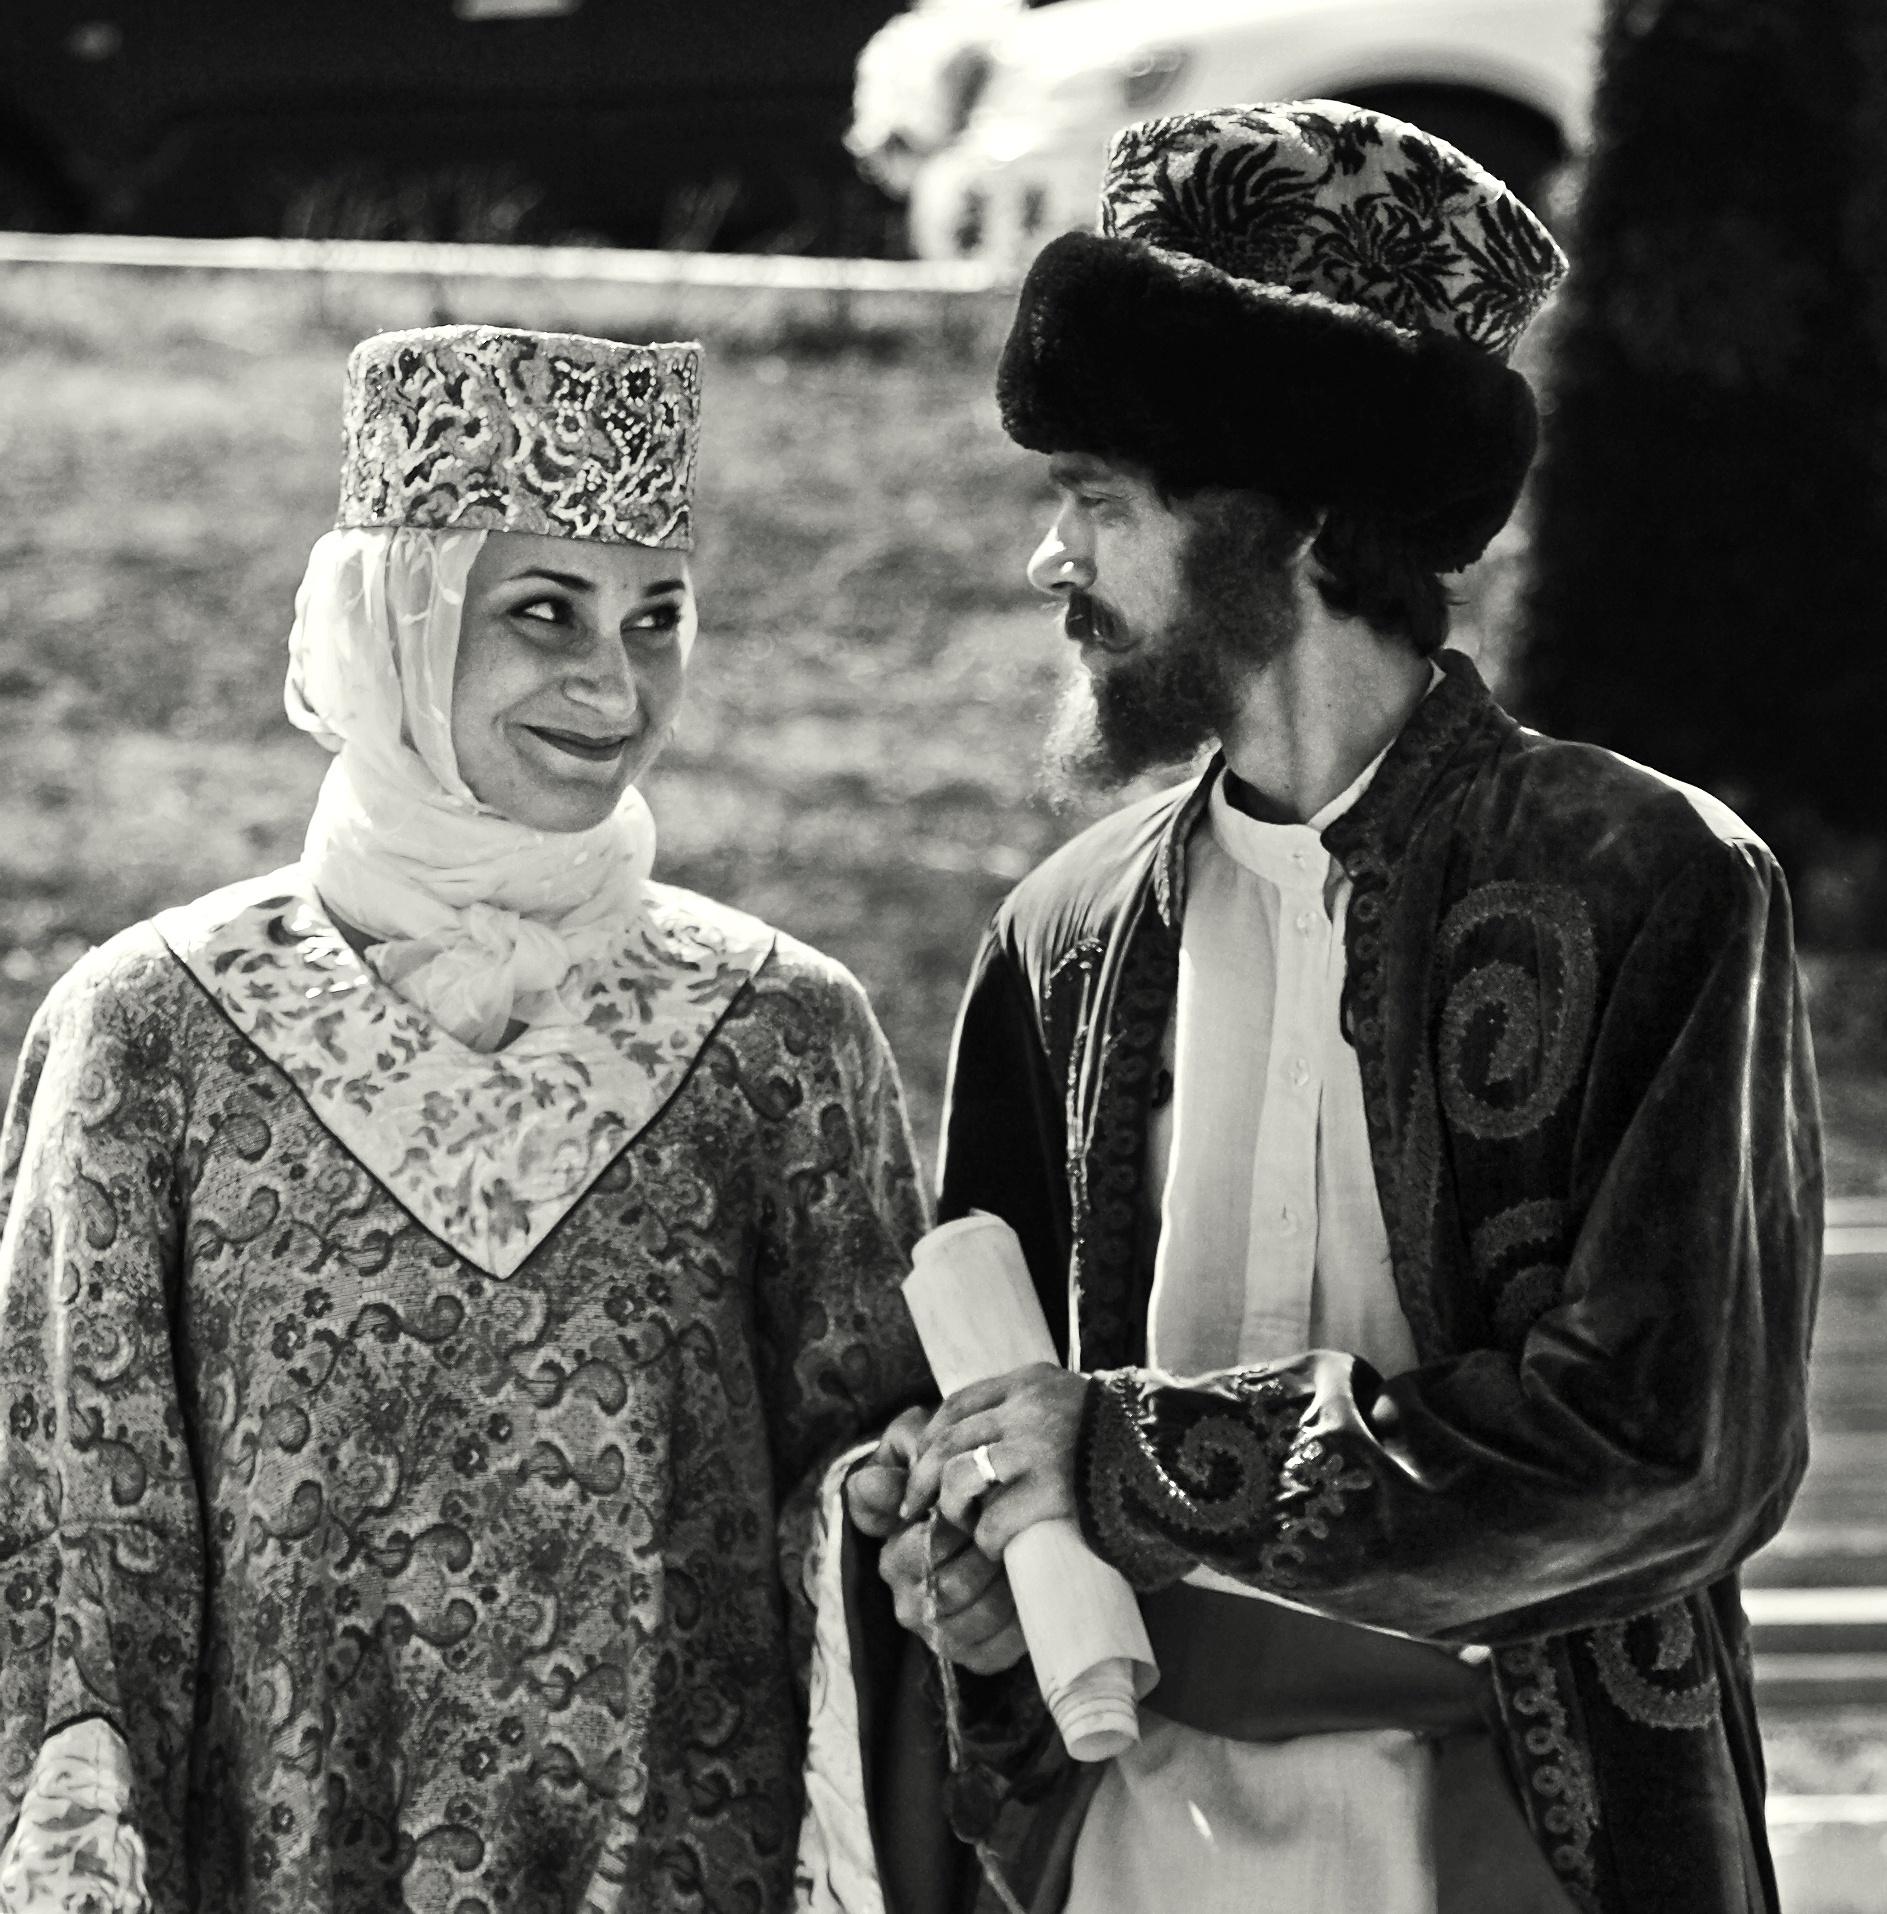 Peter and Fevronia by Сергей Юрьев